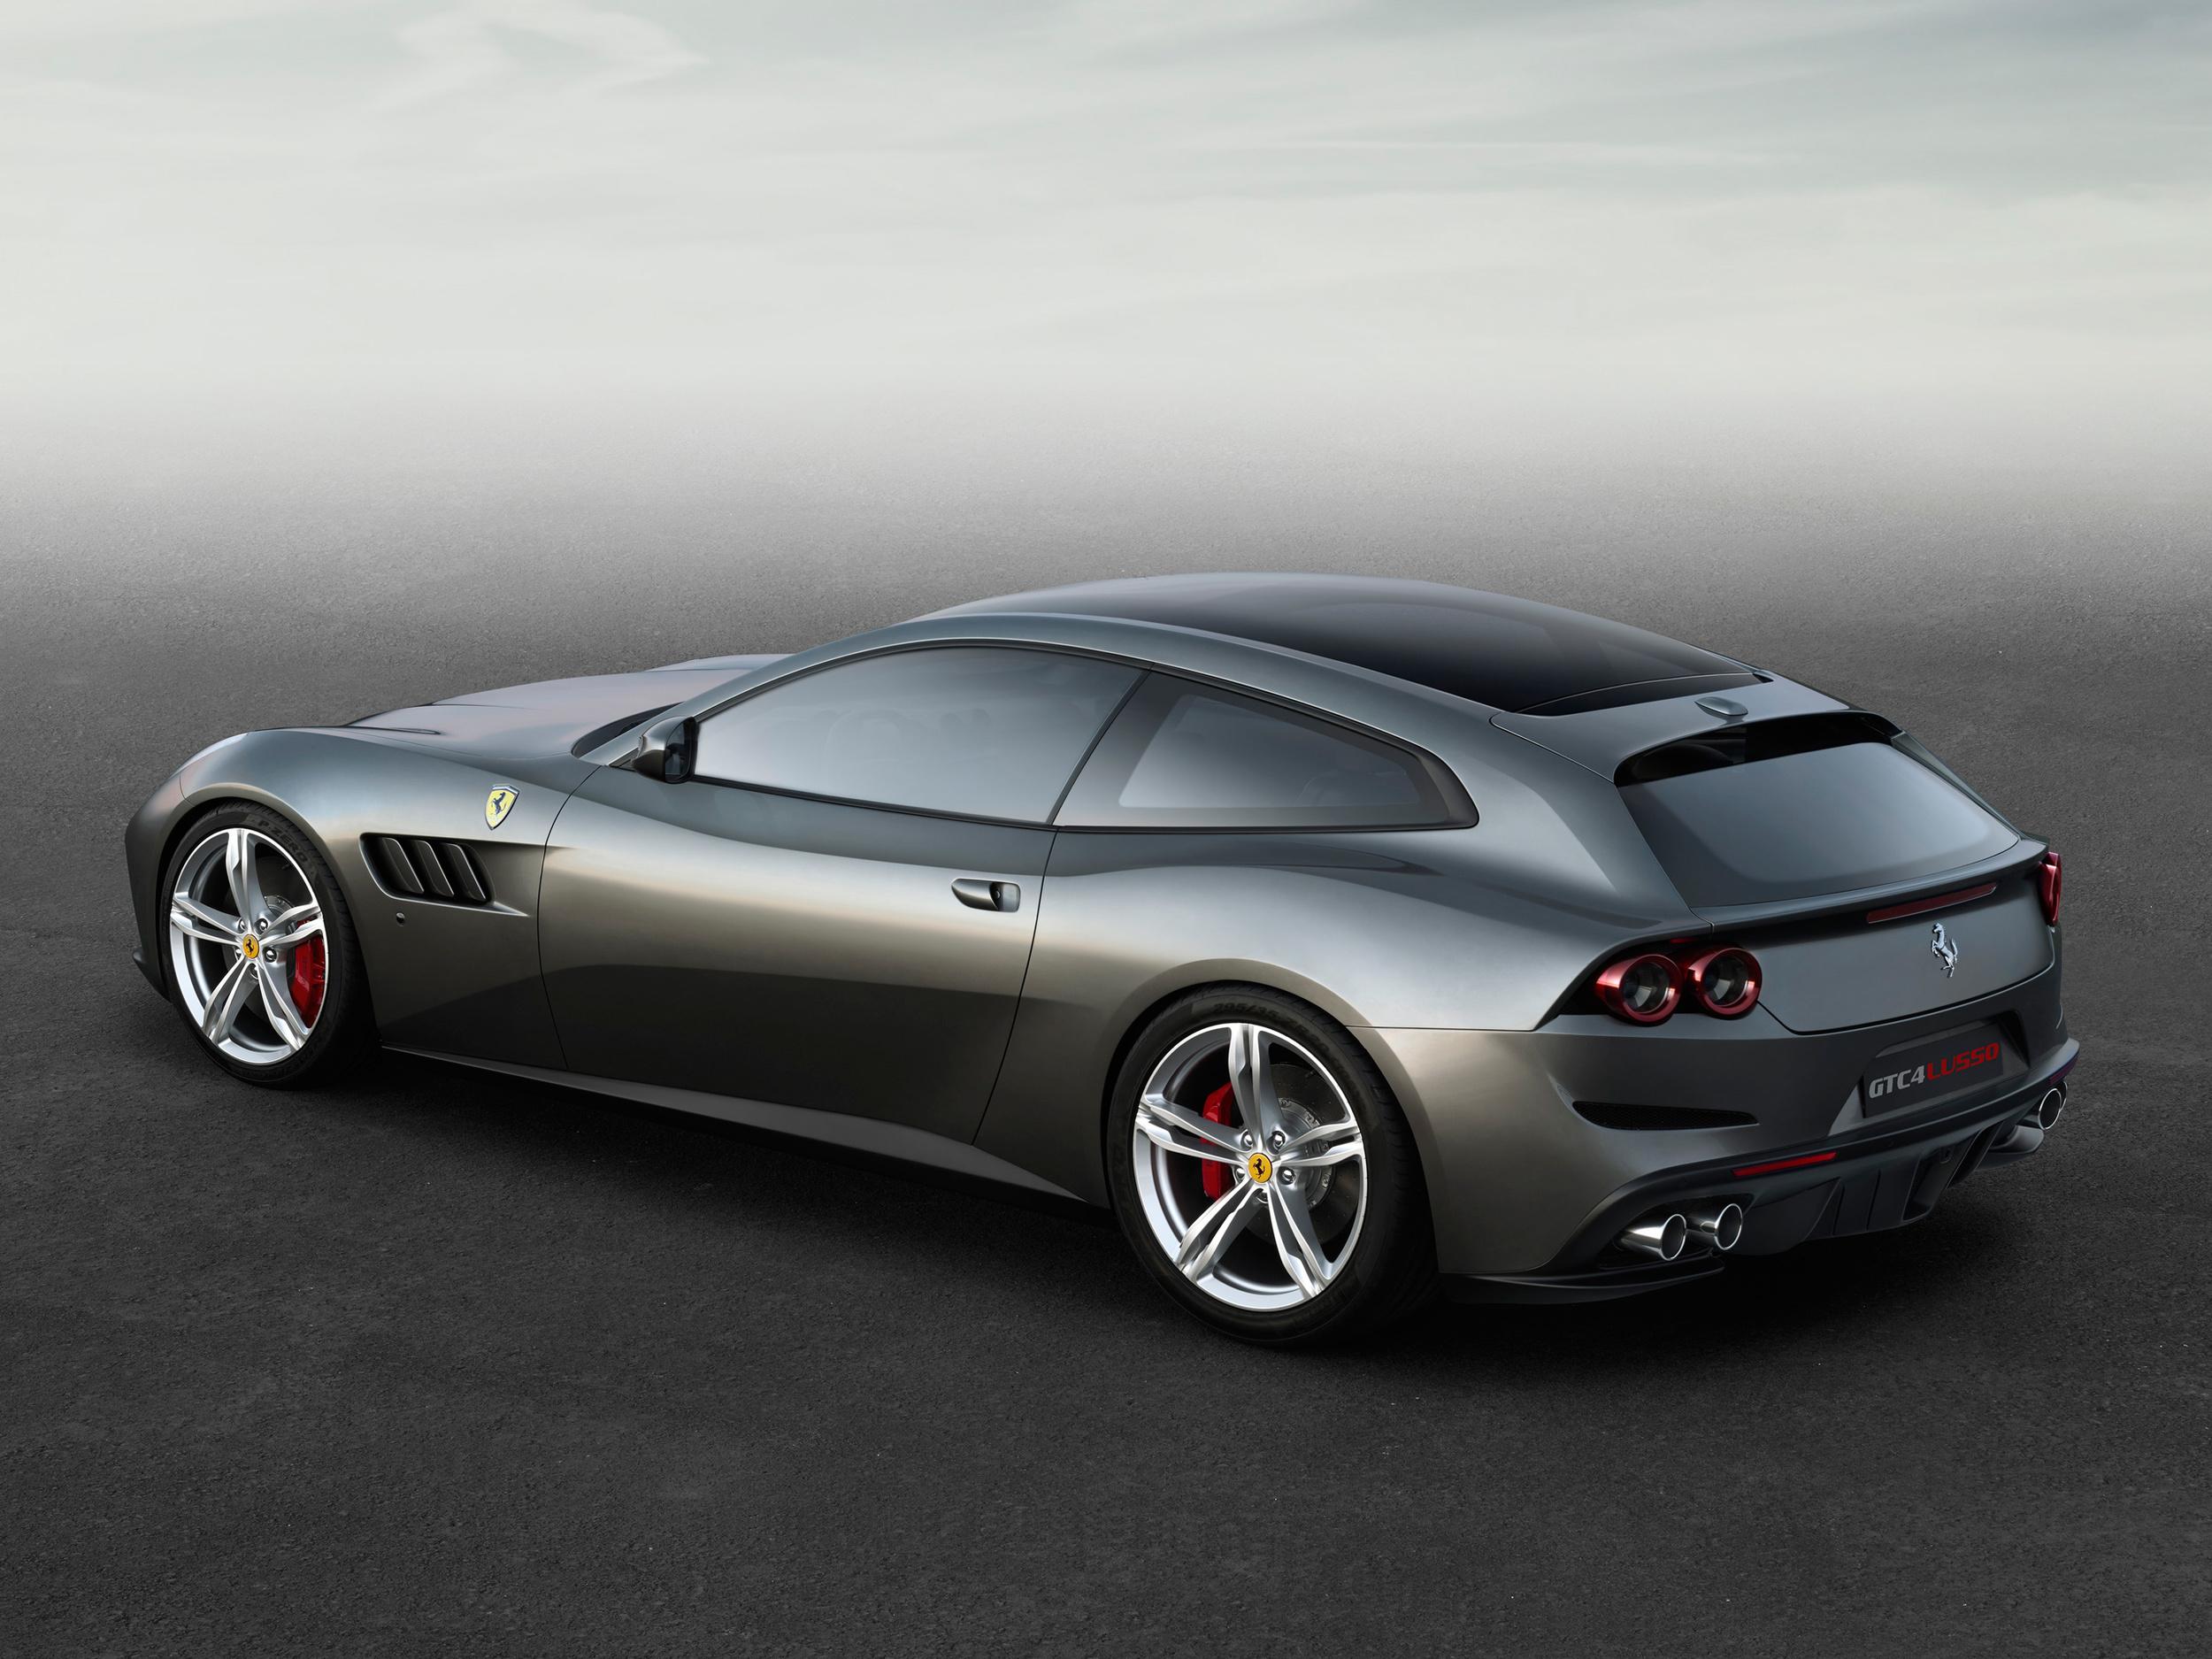 Ferrari_GTC4Lusso_side_r_high_LR.jpg